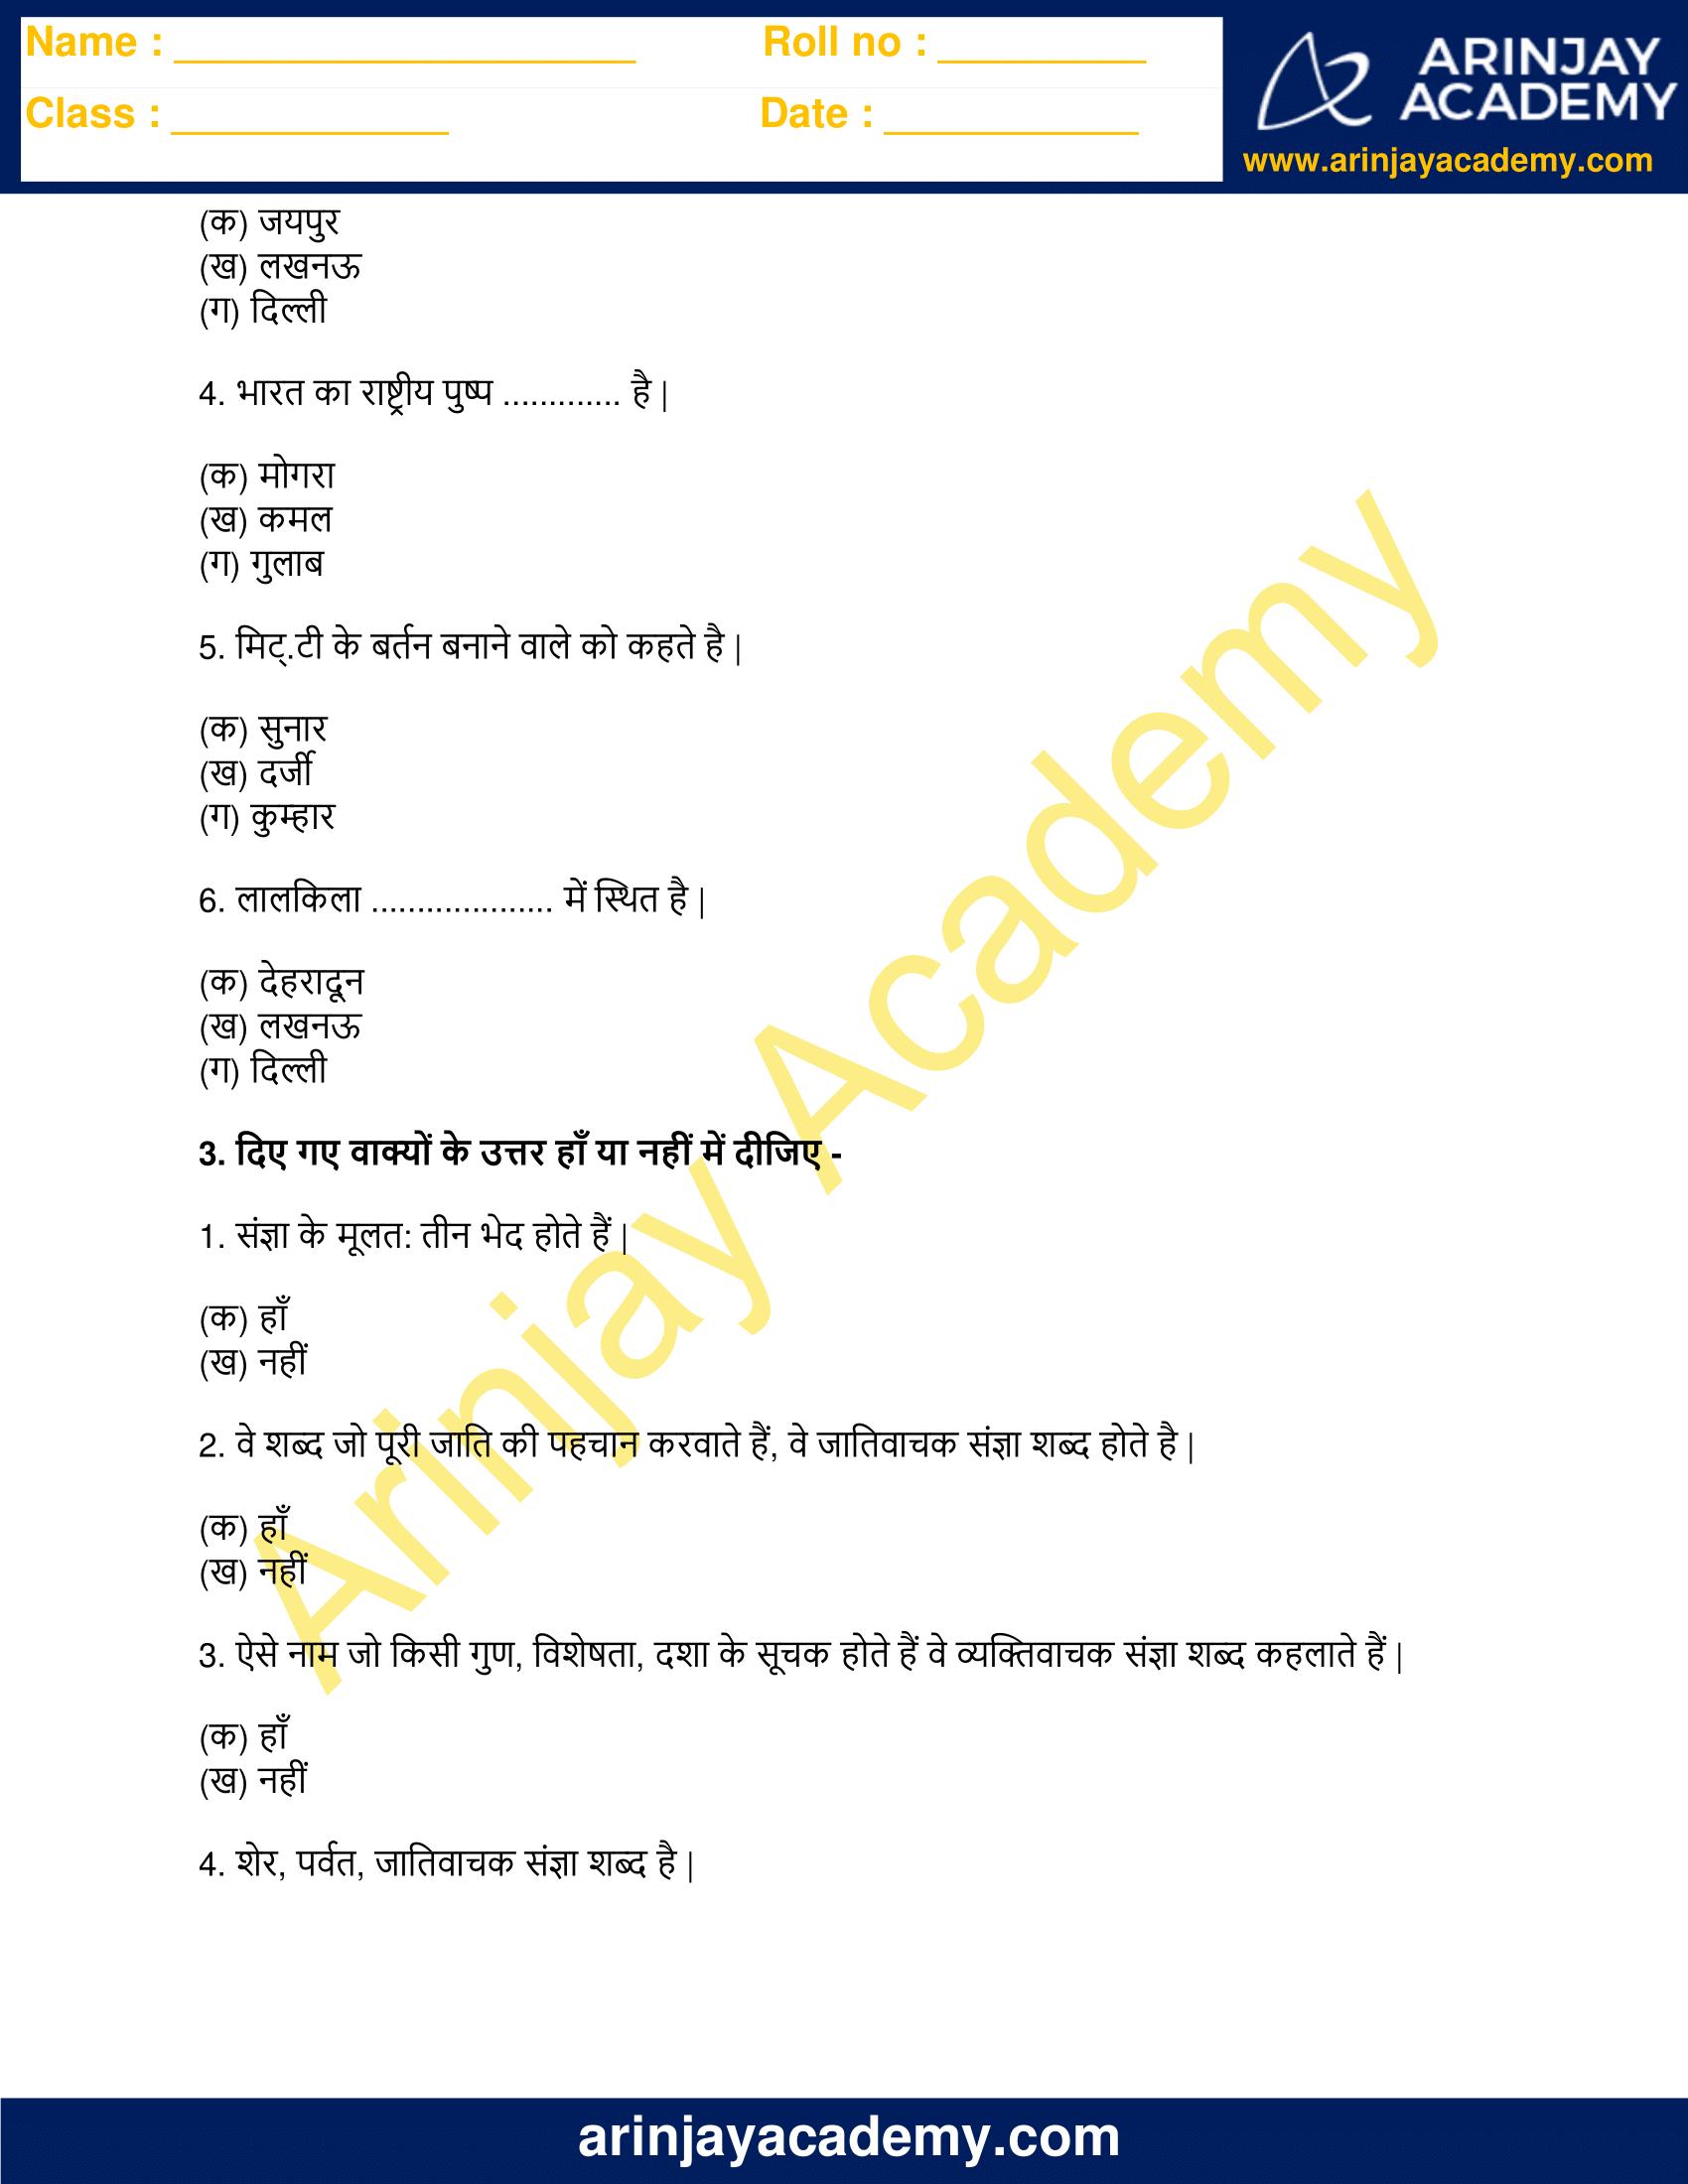 Sangya Worksheet for Class 3 image 3